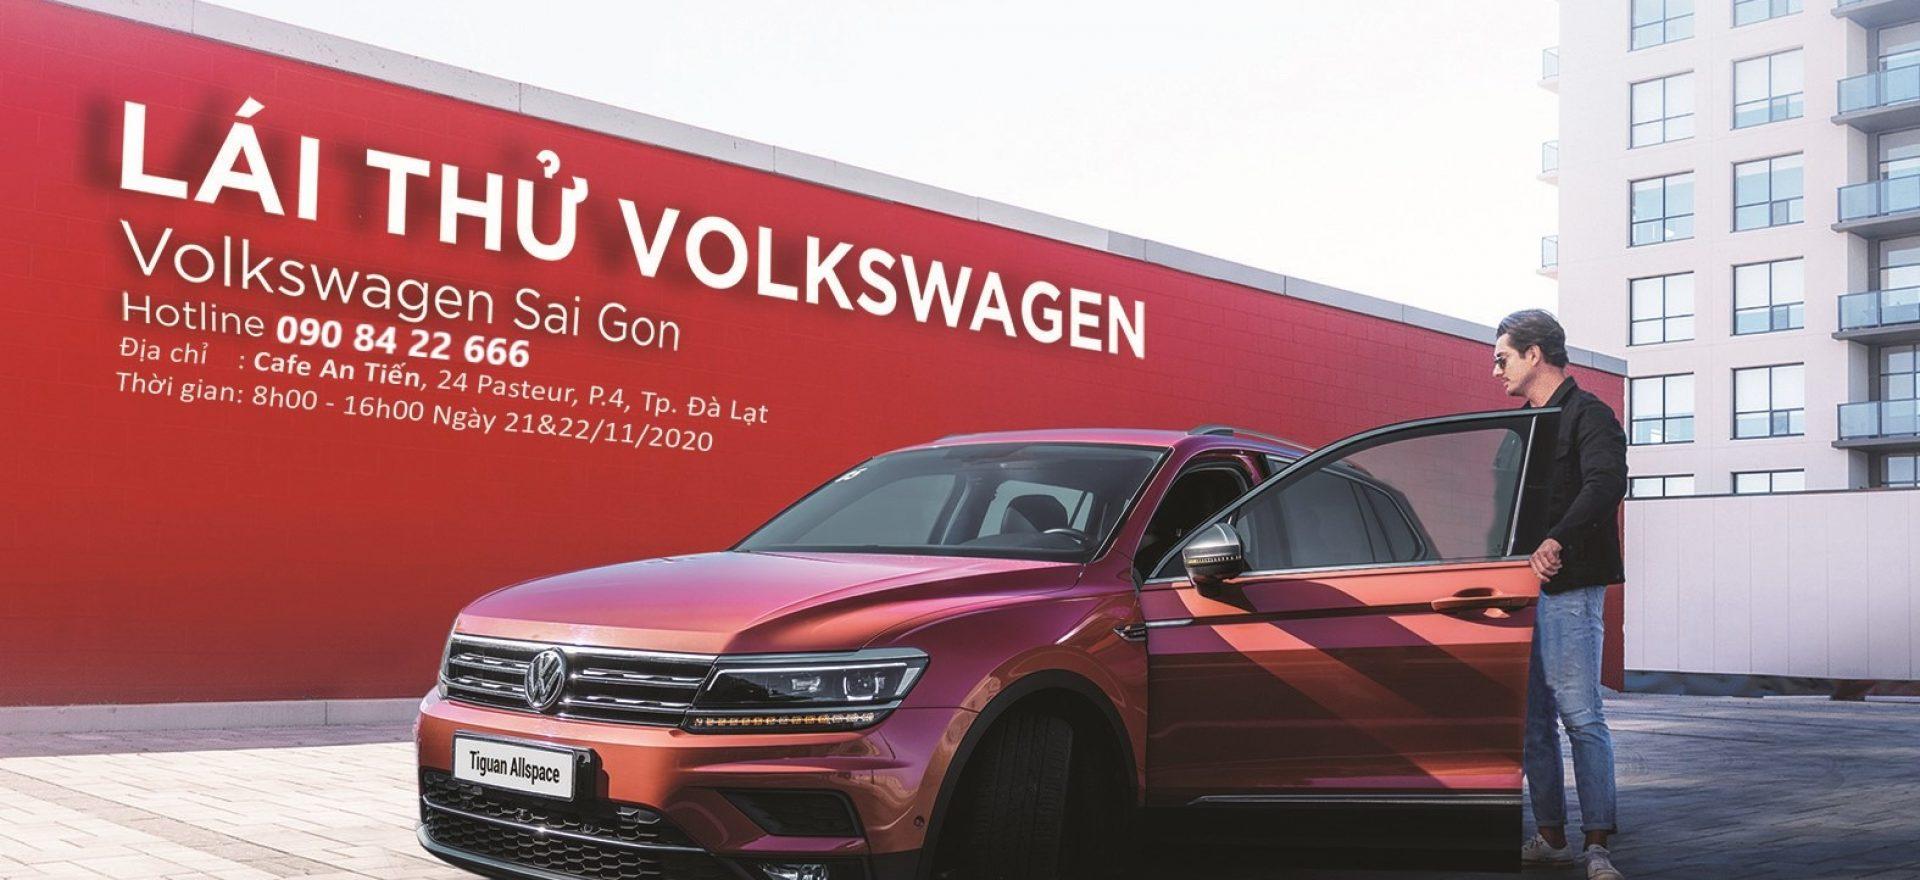 lai thu xe volkswagen tai thanh pho da lat - Volkswagen Sai Gon